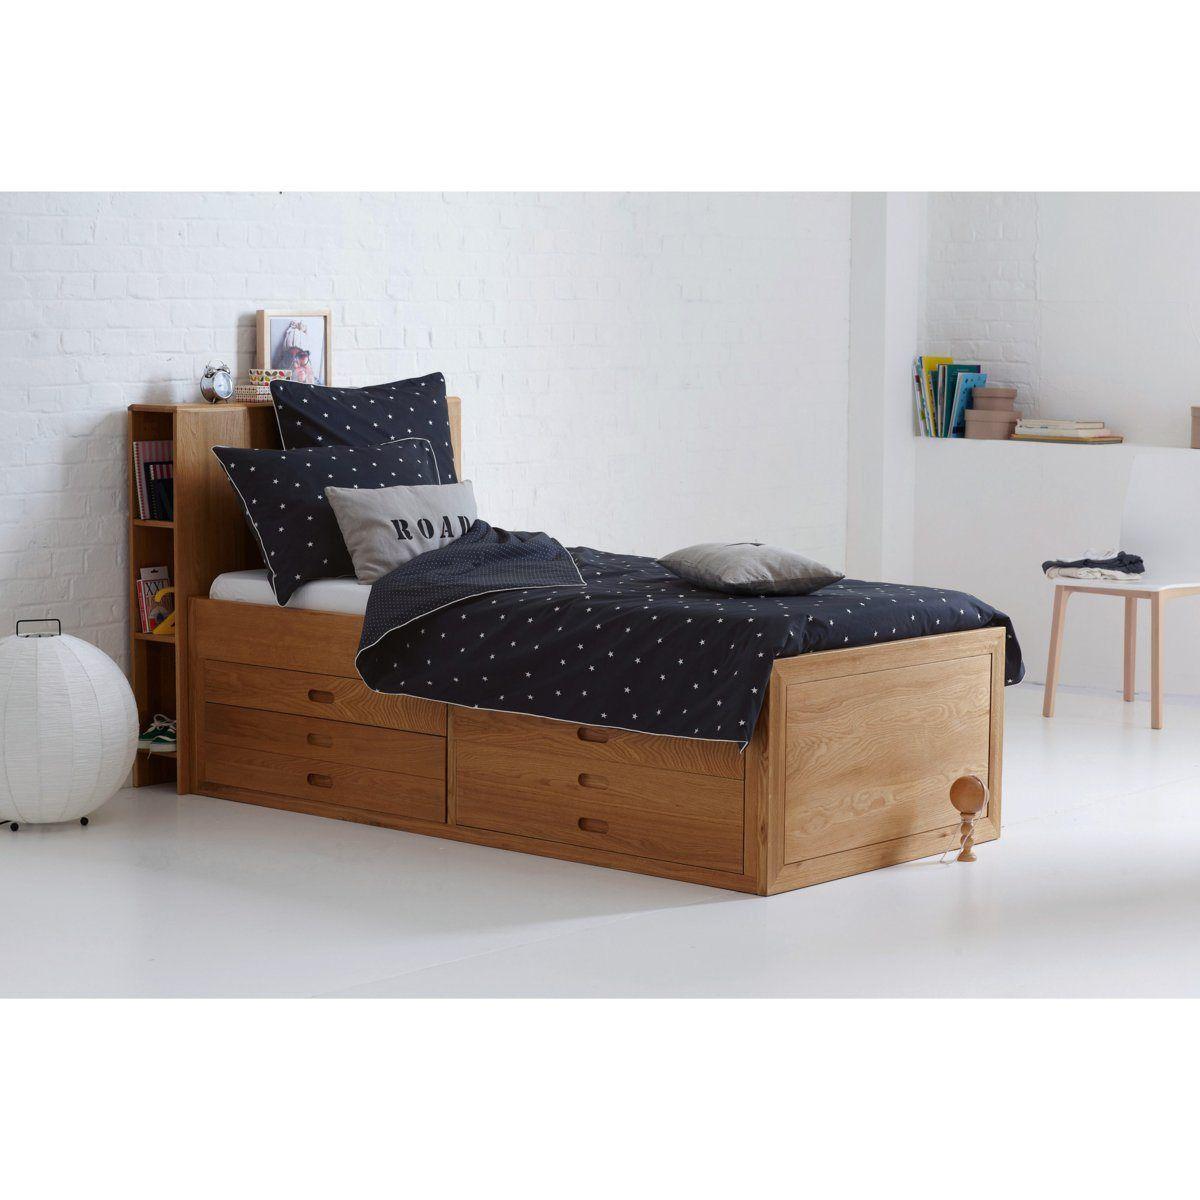 lit plateforme ch ne octavo am pm la redoute their. Black Bedroom Furniture Sets. Home Design Ideas